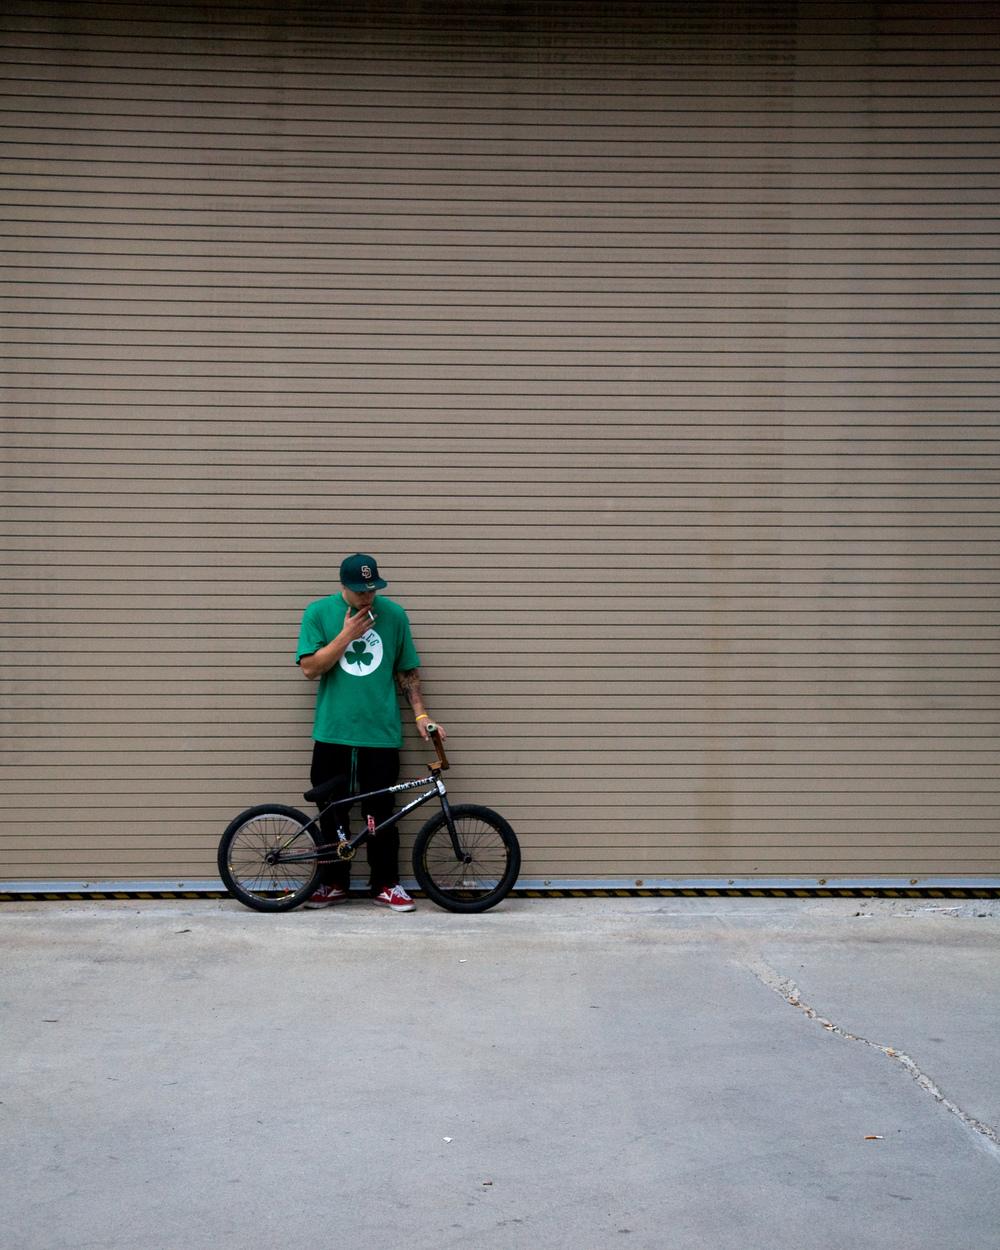 Jeff-Martin-DIG-BMX-Portrait.jpg